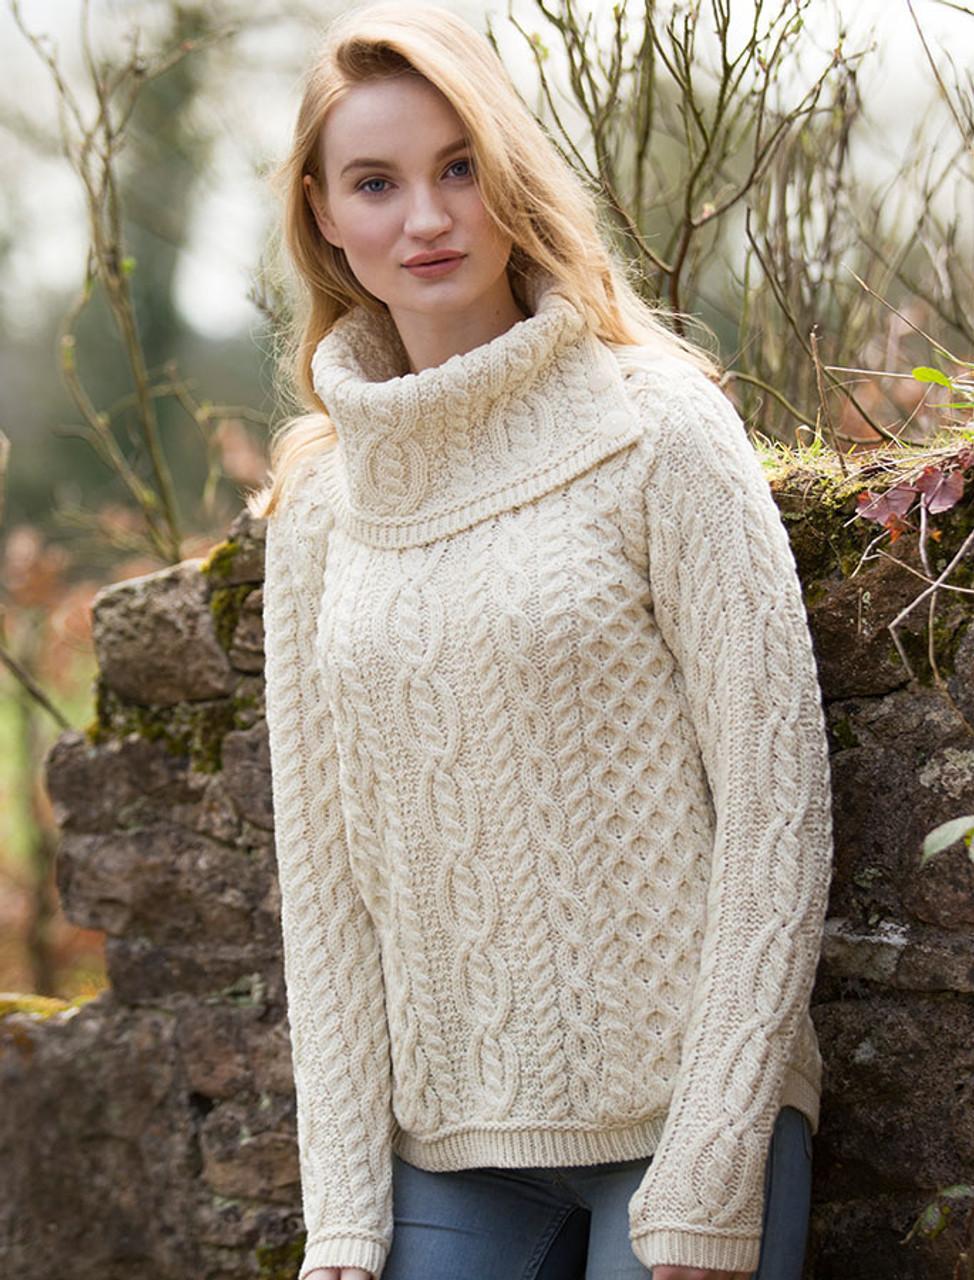 Cowl Button Neck Aran Sweater | Aran Sweater Market